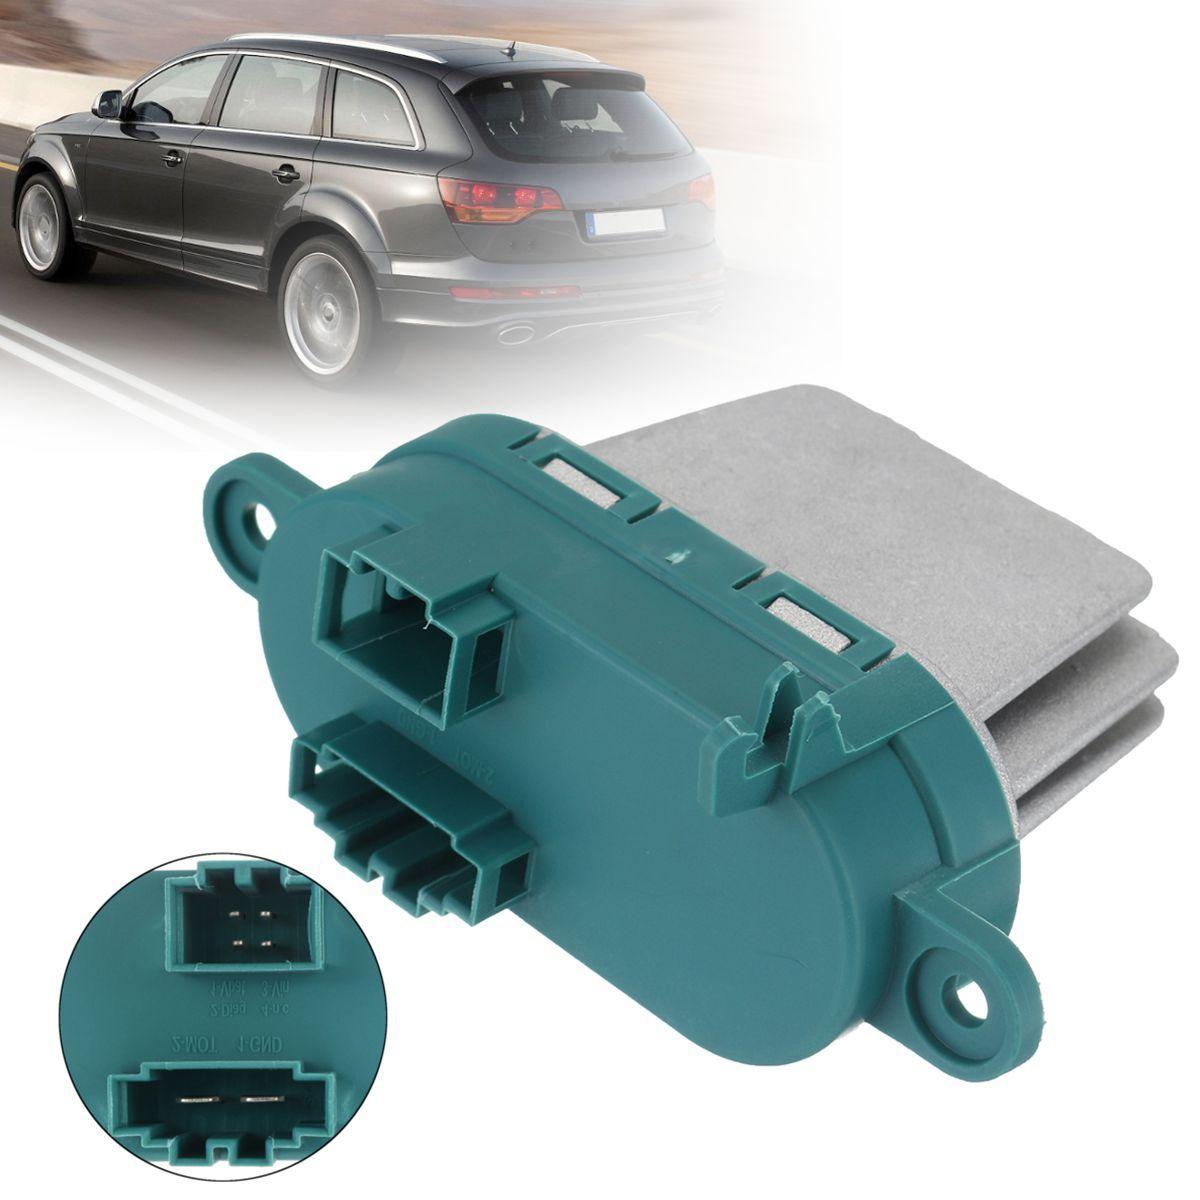 #7L0907521 Transporter Blower Fan Motor Heater Resistor Speed Controller For Audi/VW/Porsche 2011 2012 2013 2014 2015 2016 2017